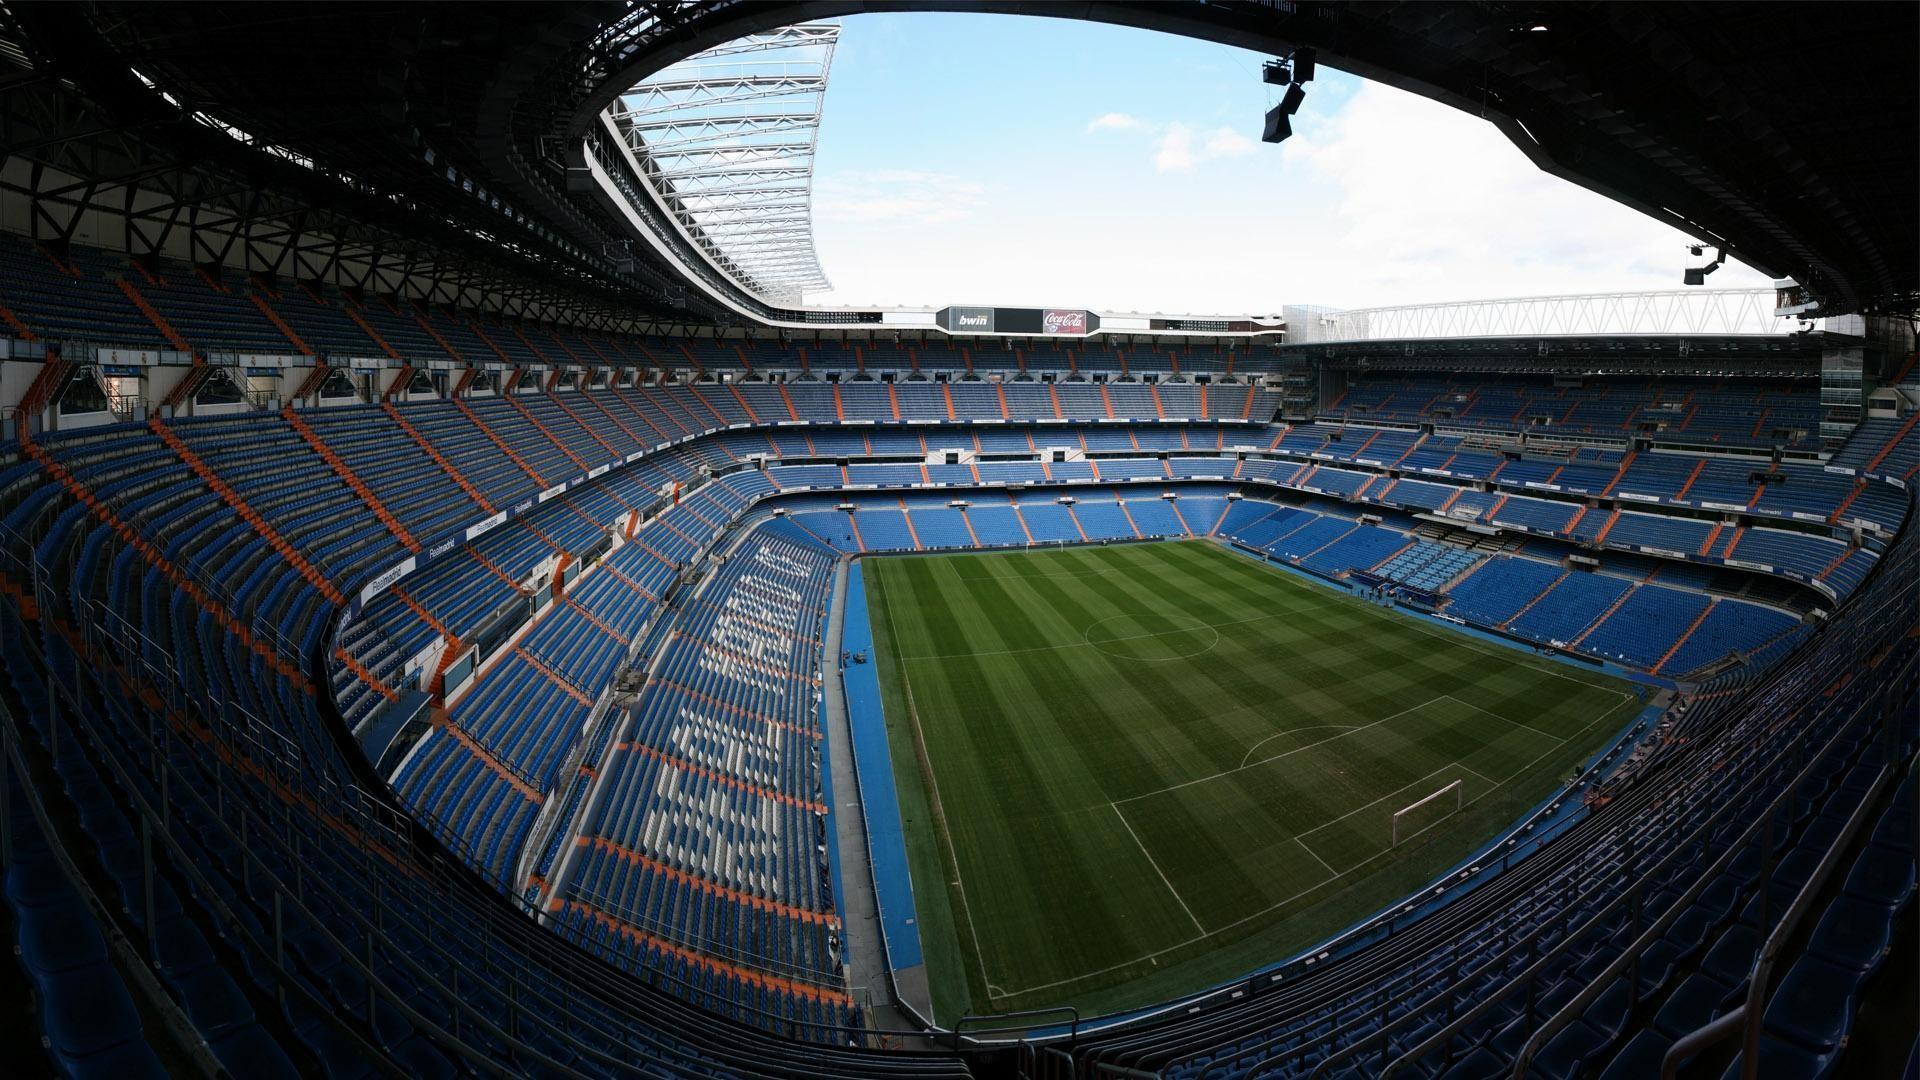 HD Soccer Stadium Wallpaper (65+ images)